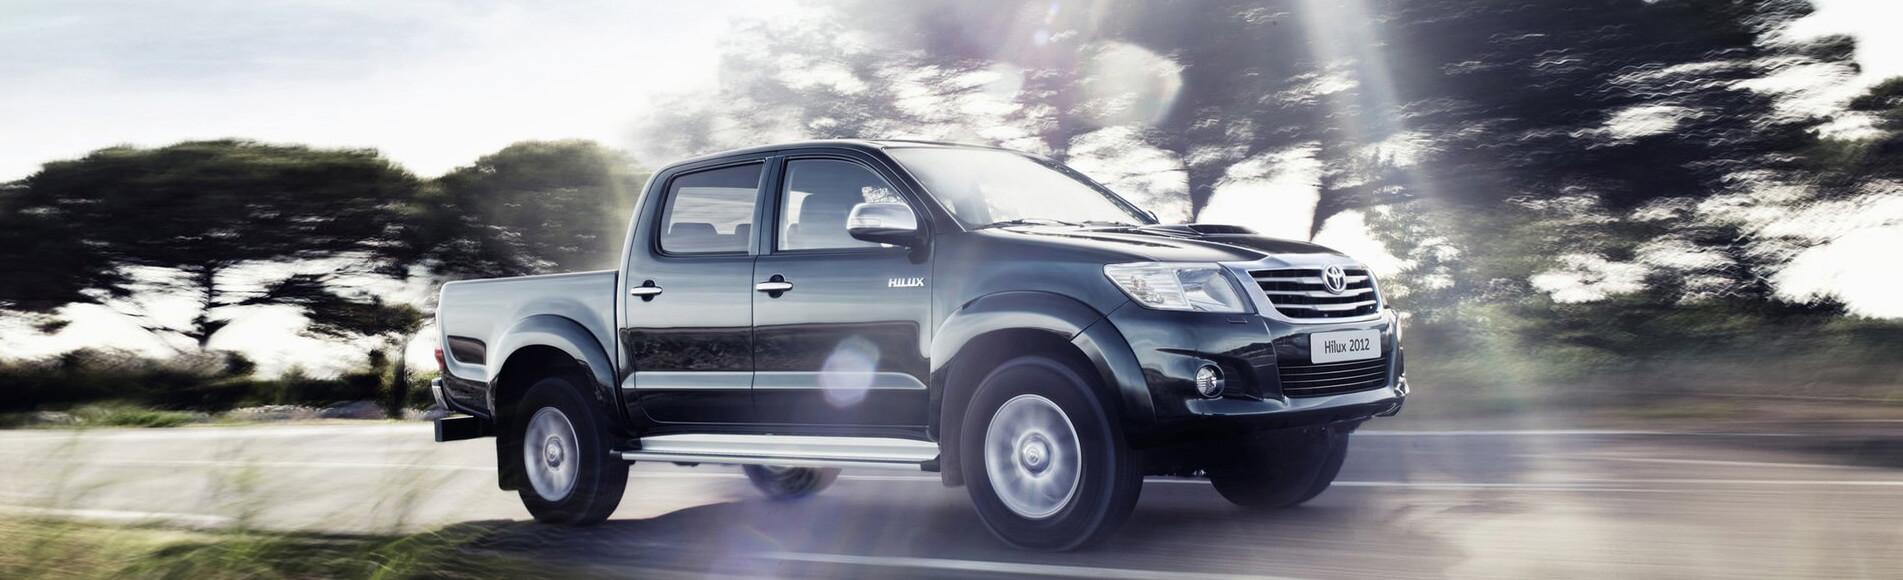 Cascade Auto Toyotas Hilux Usados En Guatemala Inventory